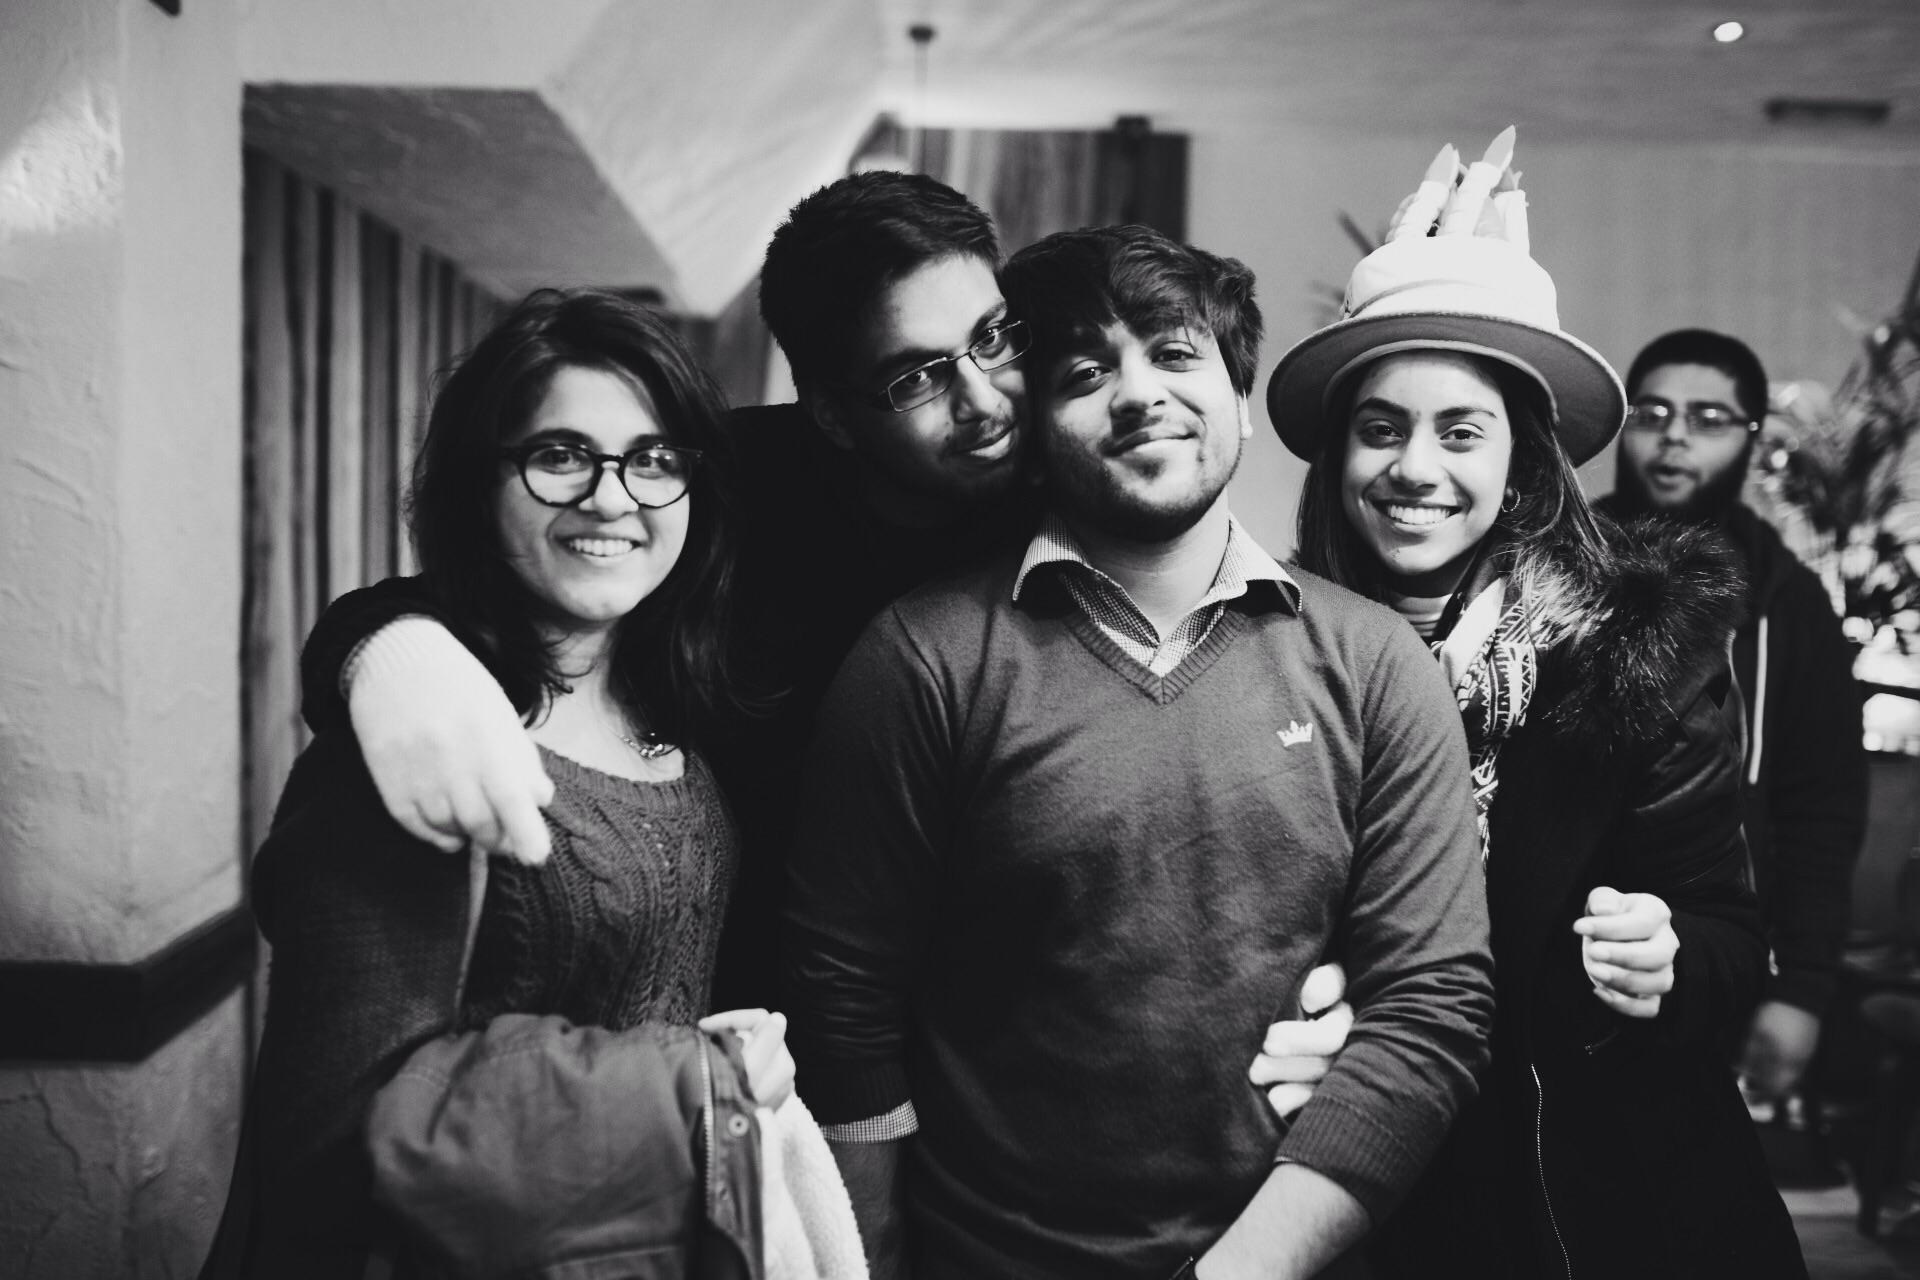 Ismaeel's Birthday: Me, Dheena, Aahuti and Saqlain